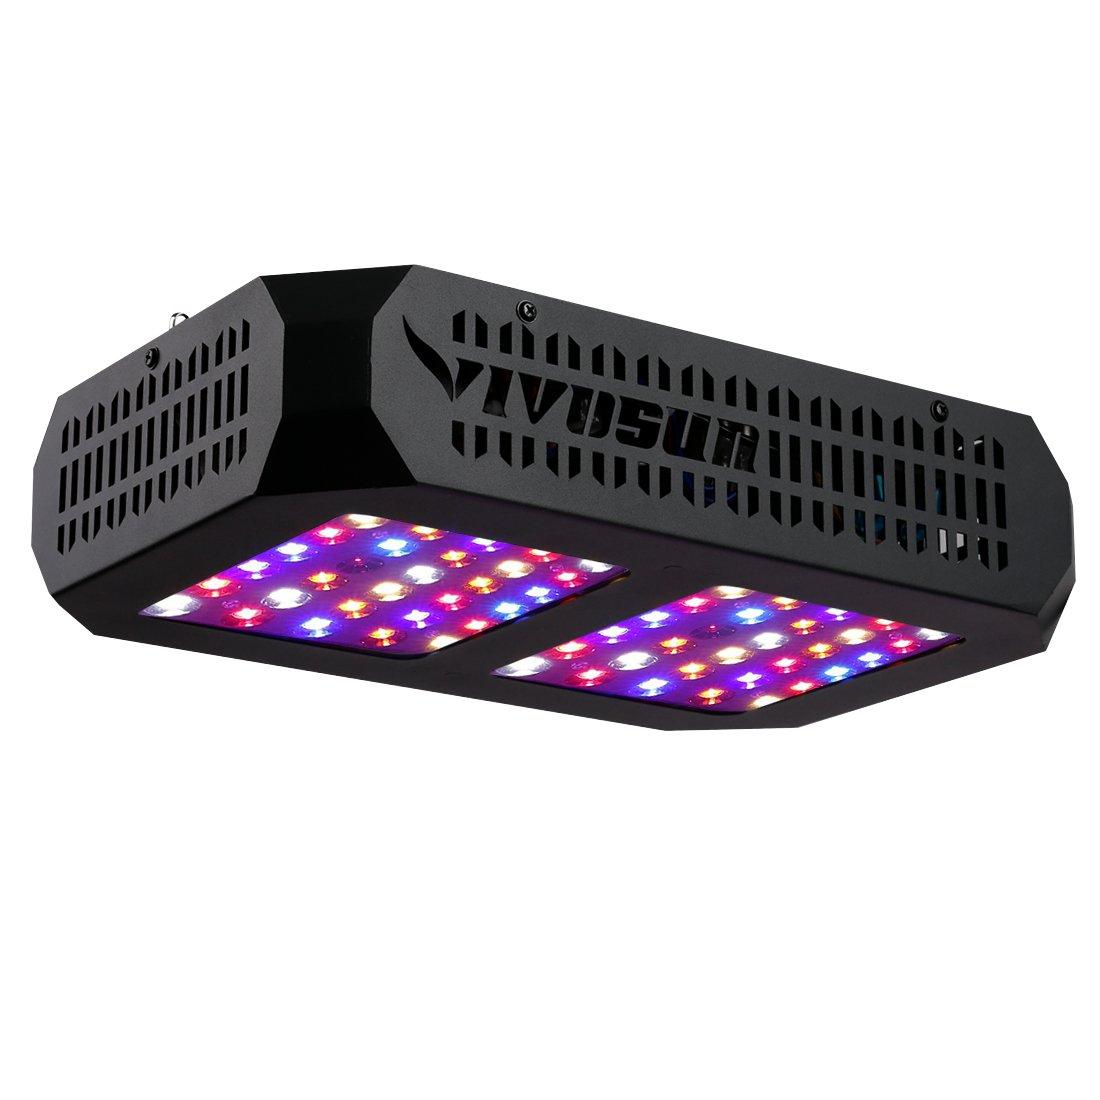 VIVOSUN 300W LED Grow Light Full Spectrum for Hydroponic Indoor Plants Growing Veg and Flowering